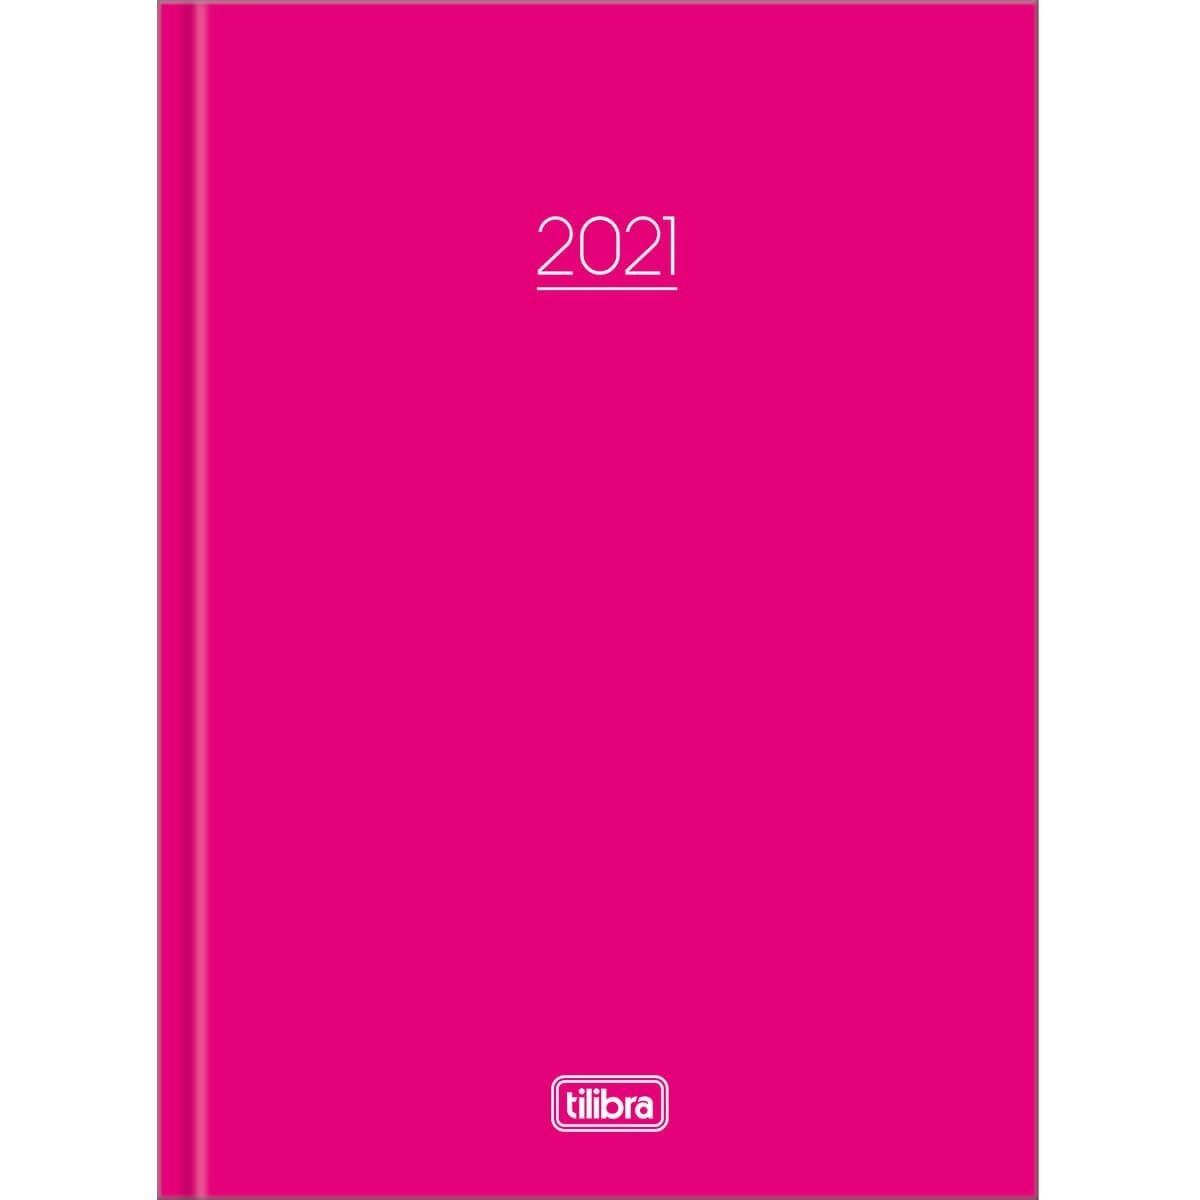 Agenda Costurado Rosa 2021 Pepper M4 Tilibra